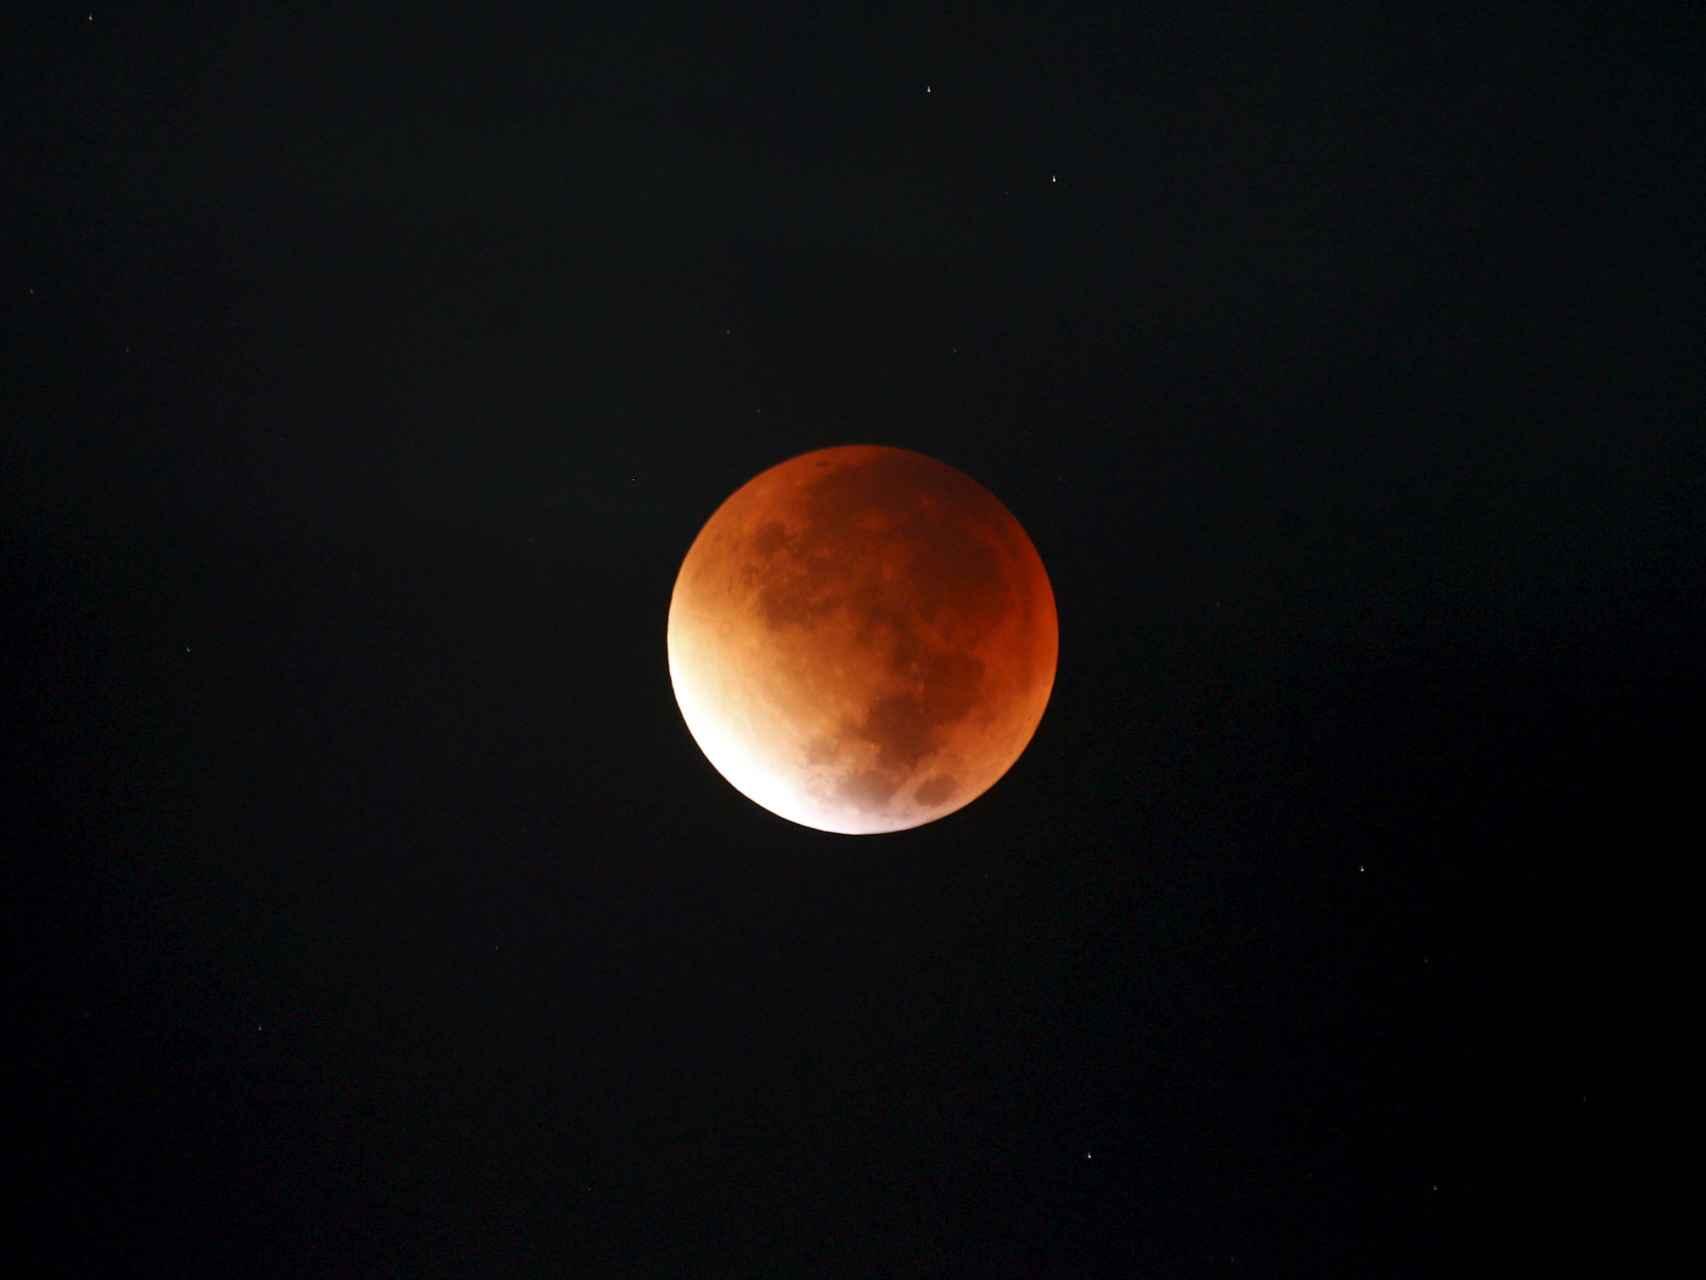 Imagen del eclipse en Amán, capital de Jordania.